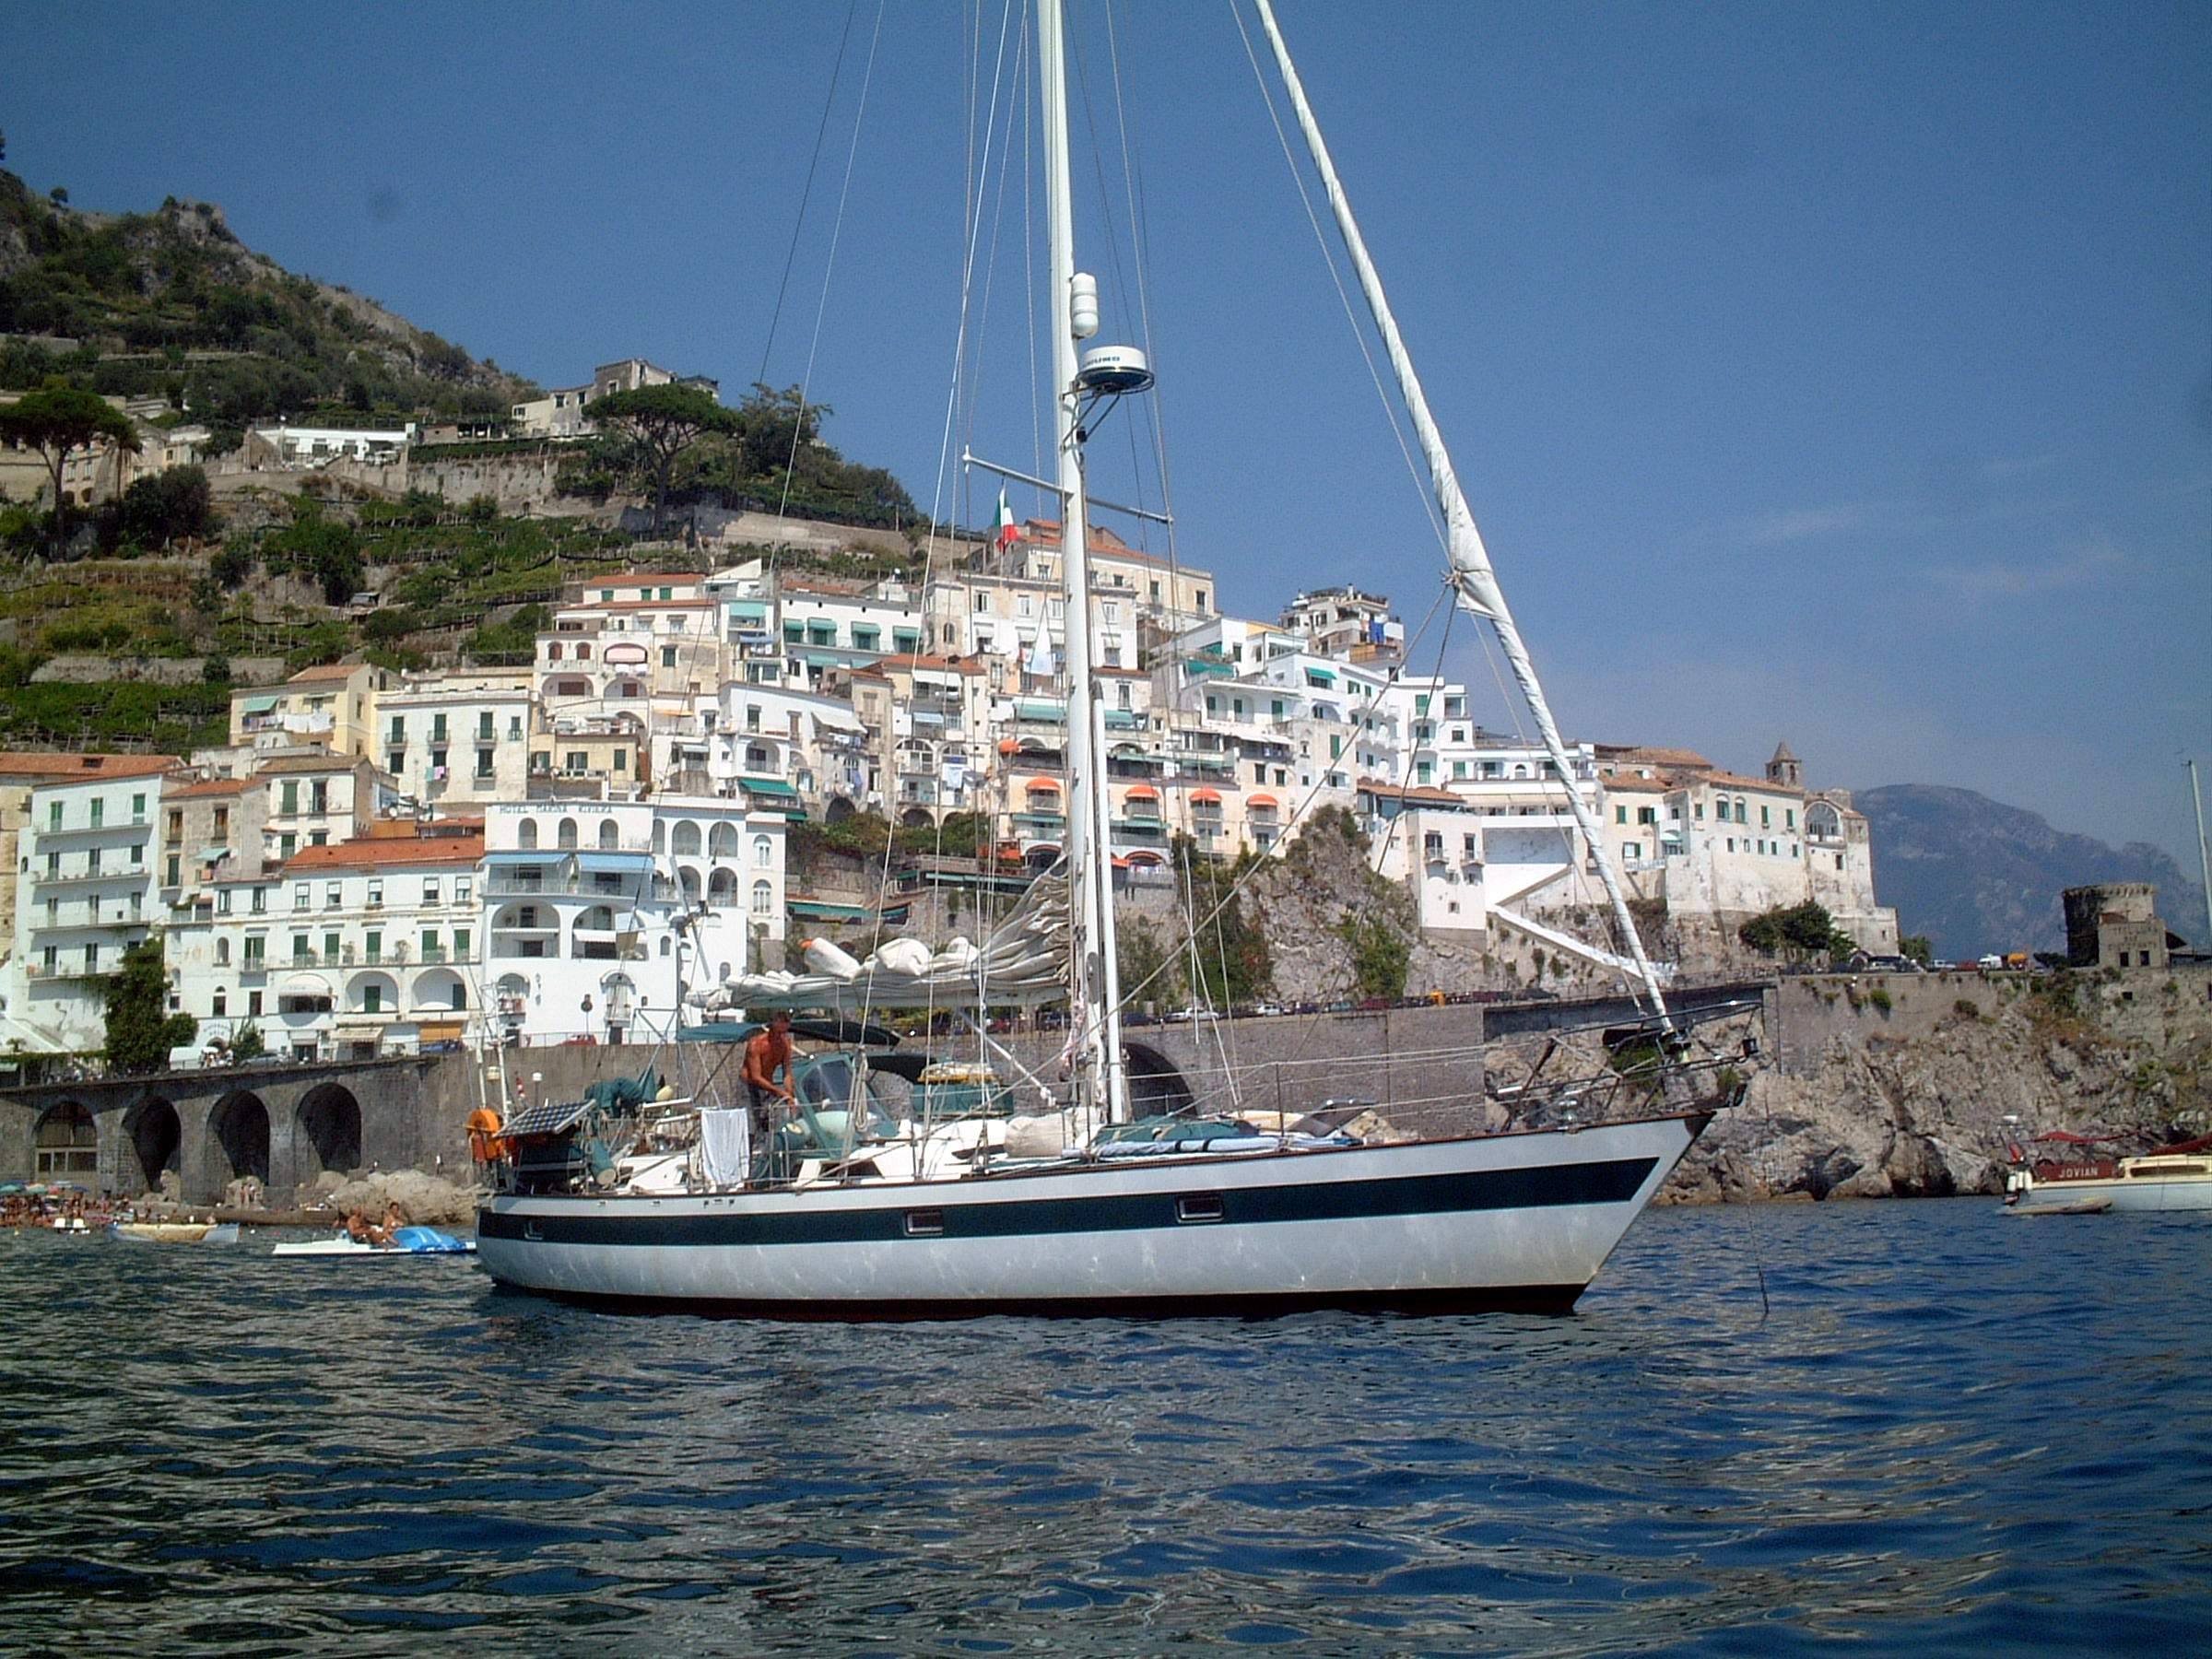 Amalfi024.JPG